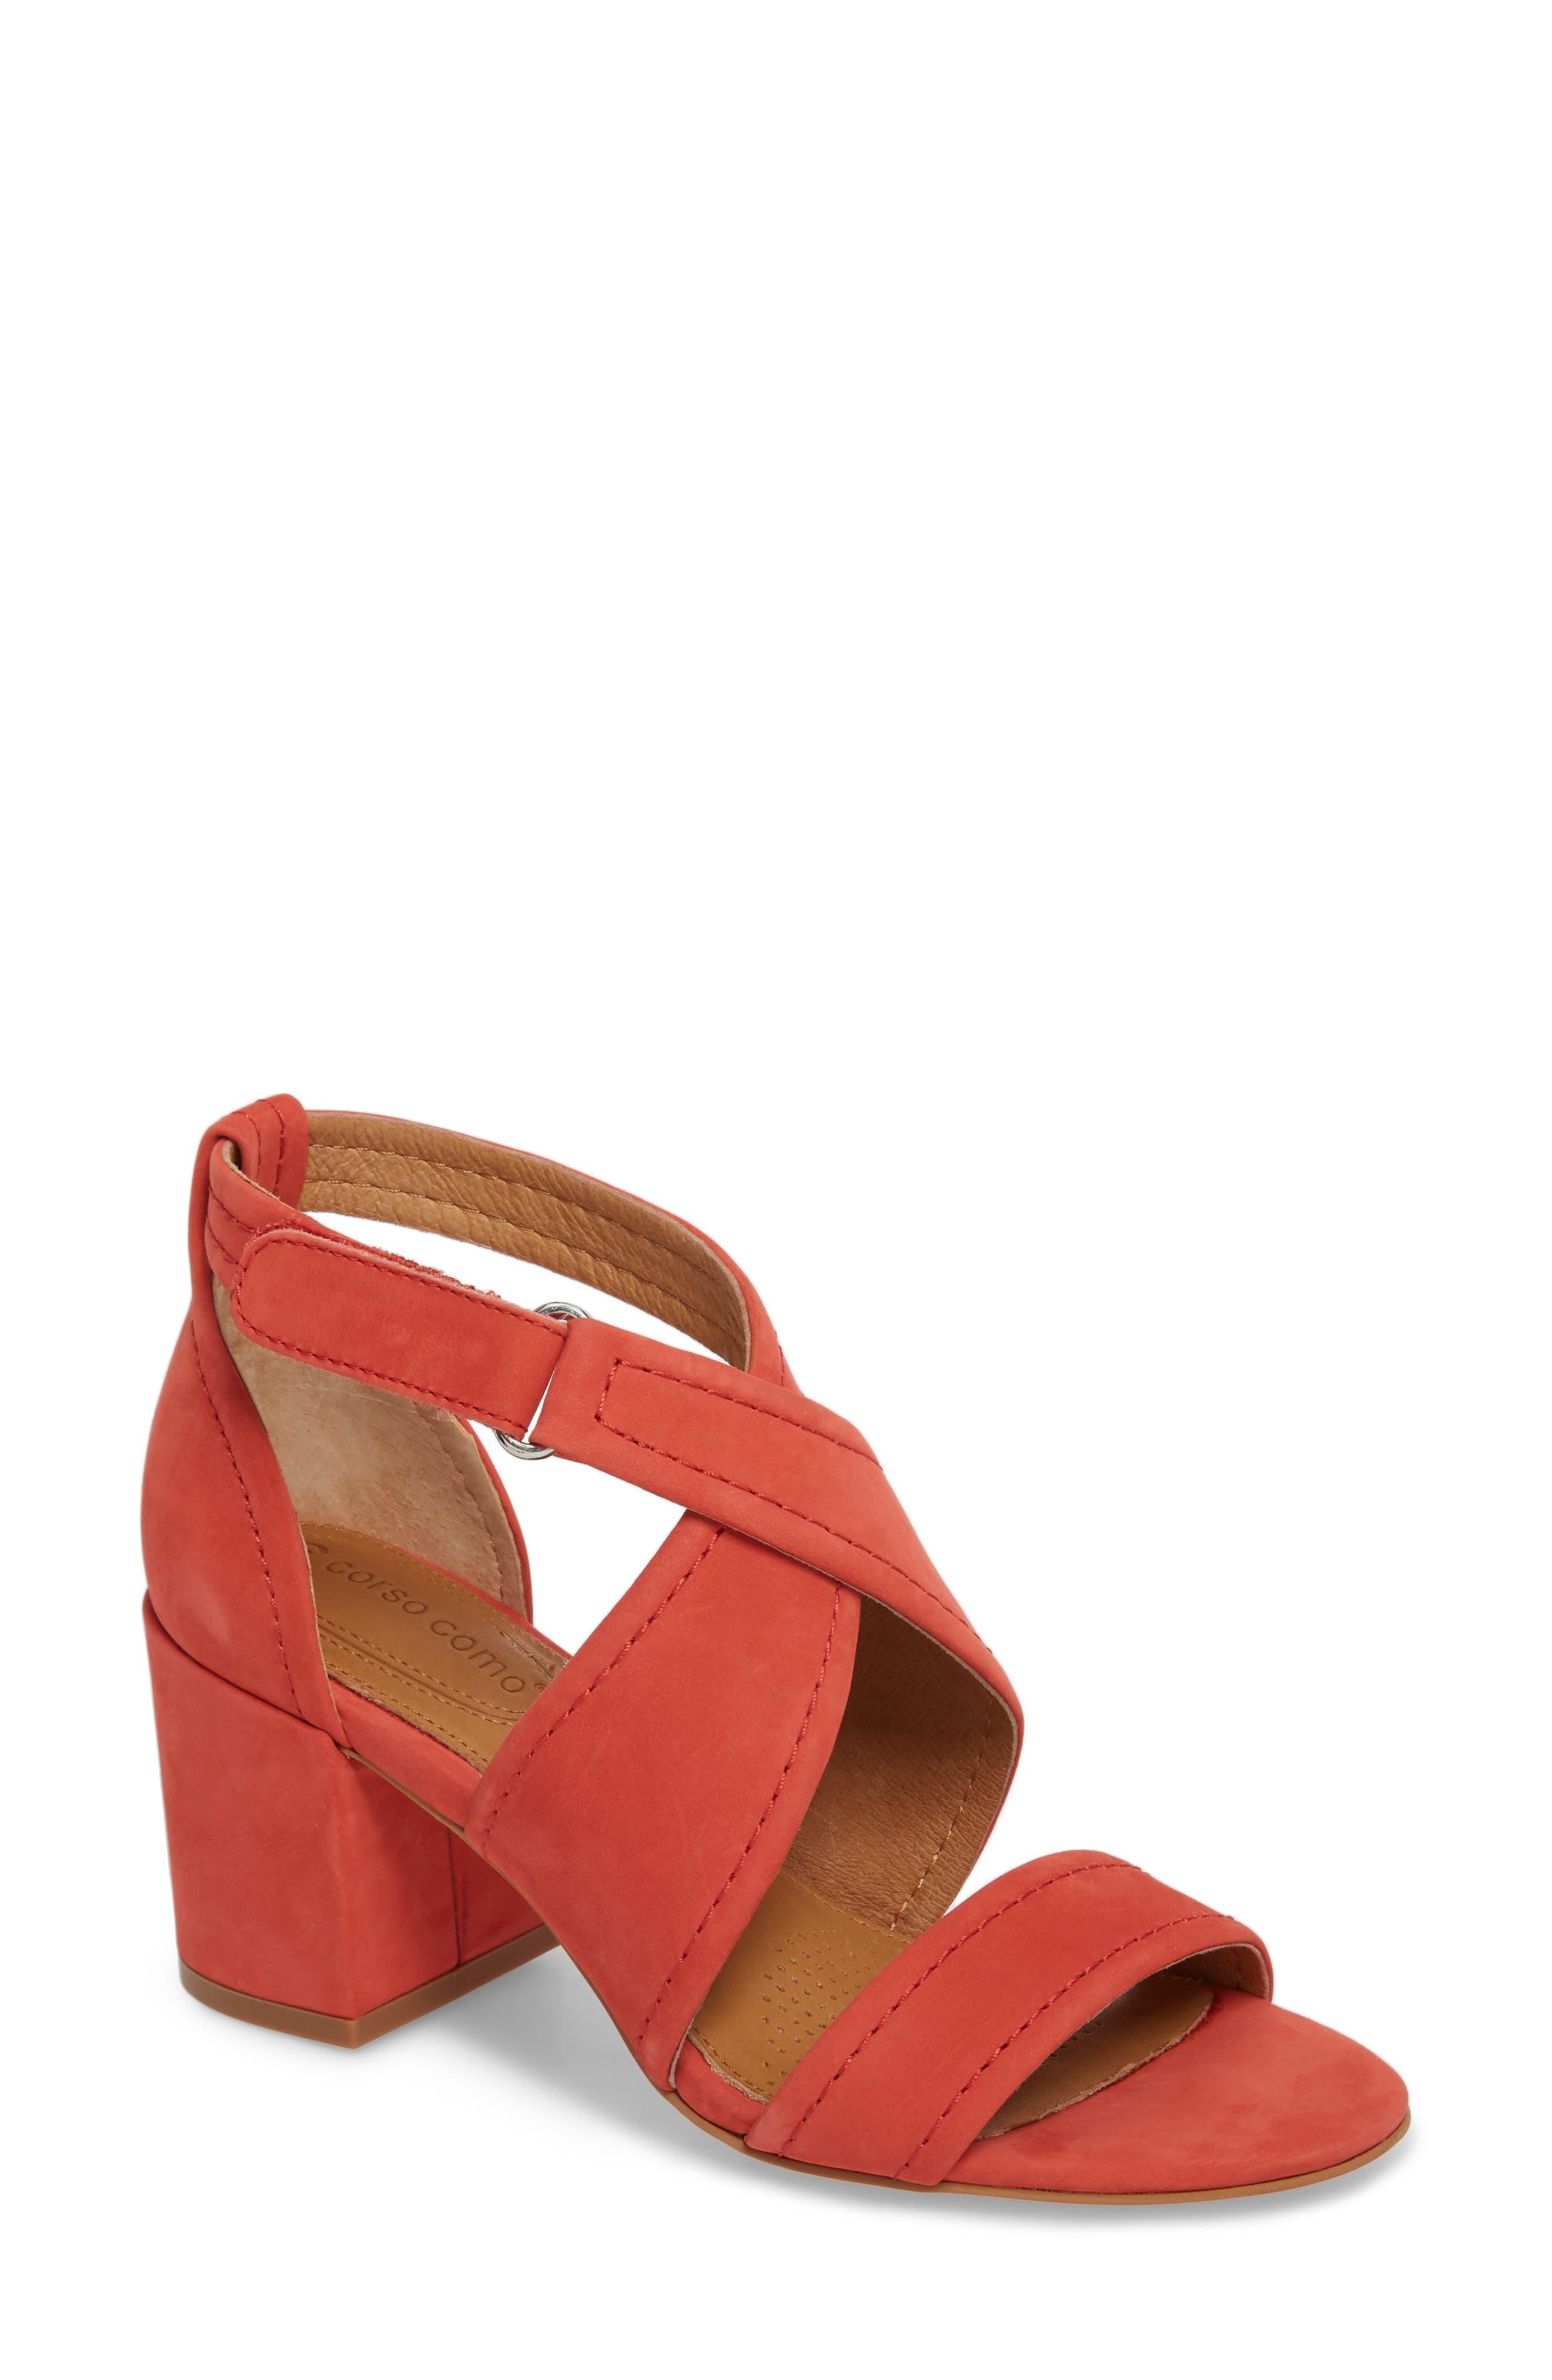 Cc Corso Como Nattie Sandal, Red